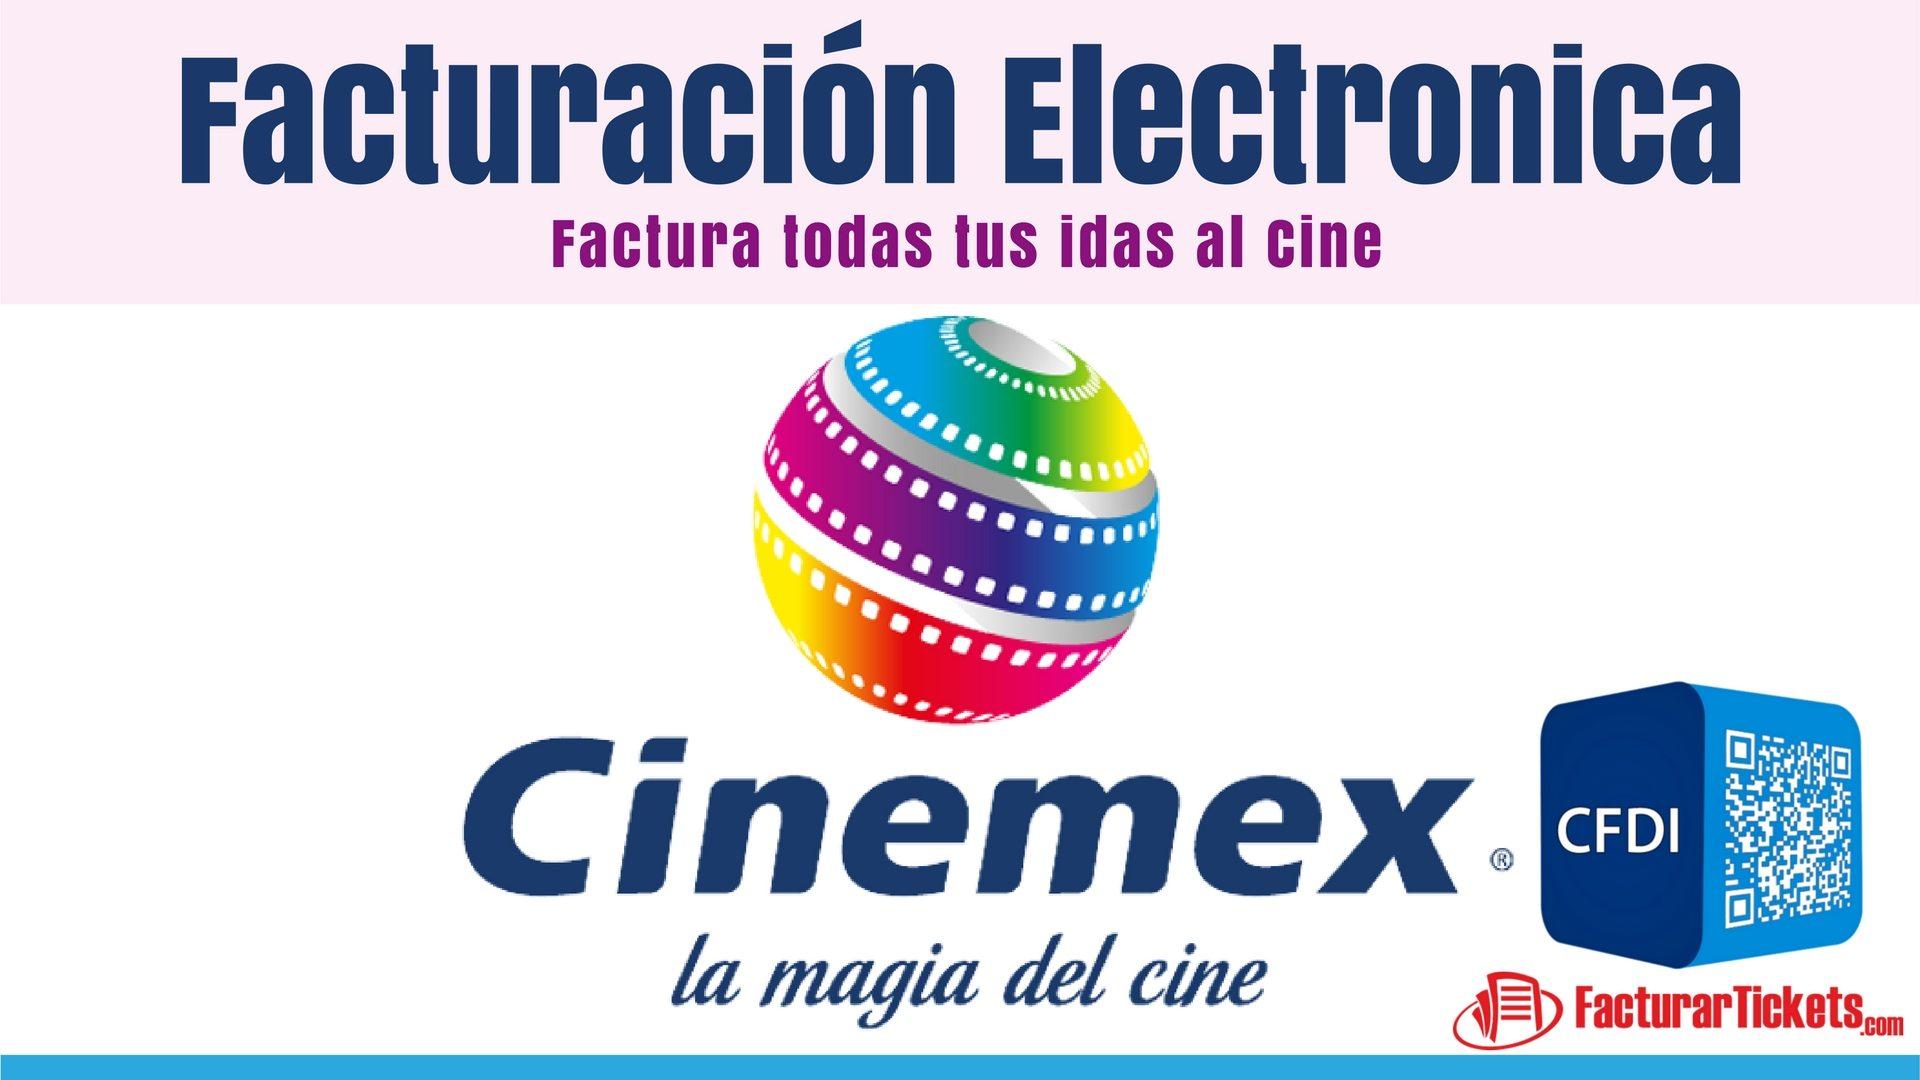 Cinemex Facturacion Electronica